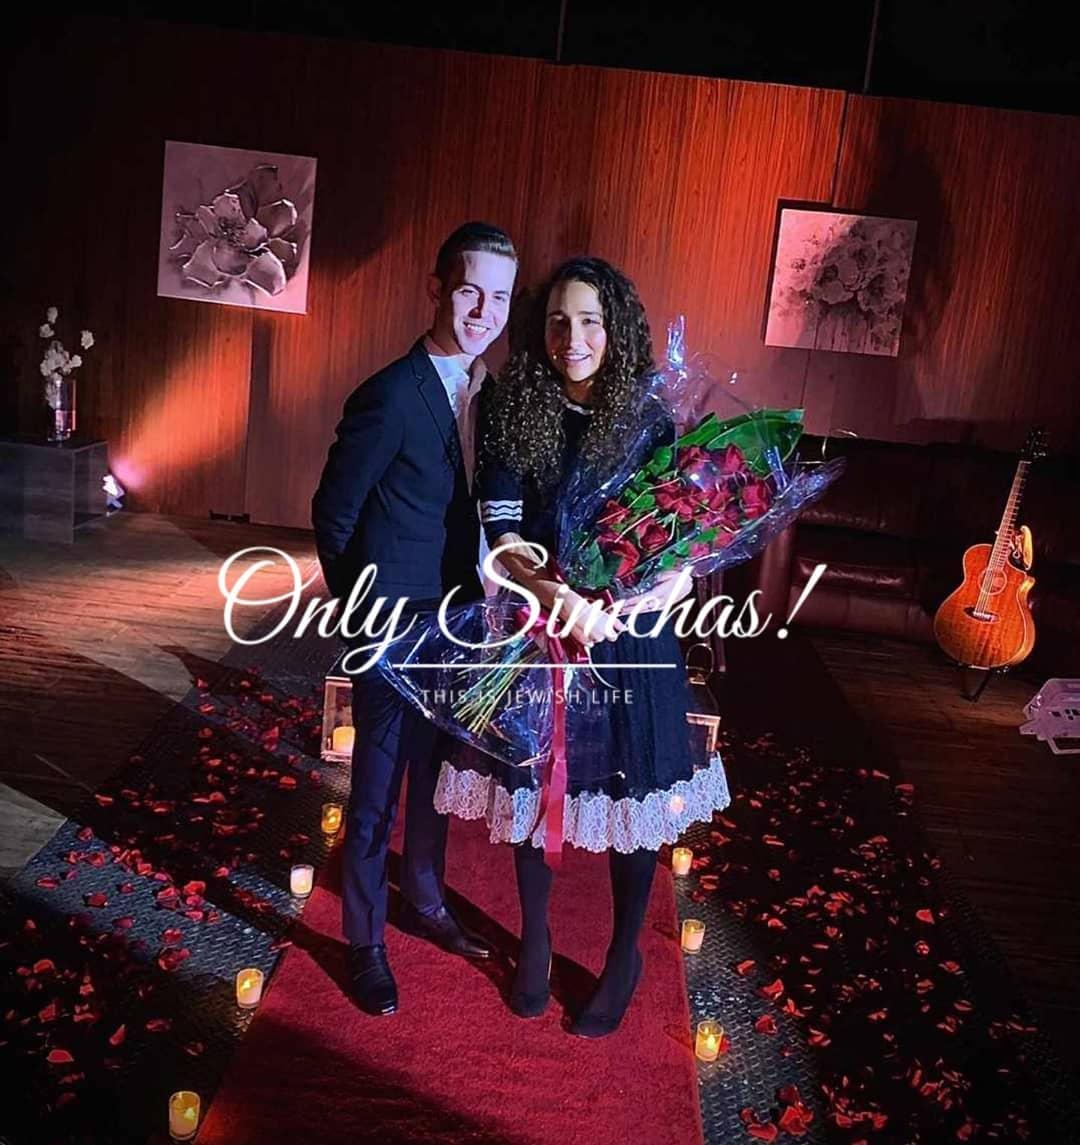 Engagement of Tzvi Fishoff (rythem5) to Aviva Rosenberg!! #onlysimchas via @yankelas